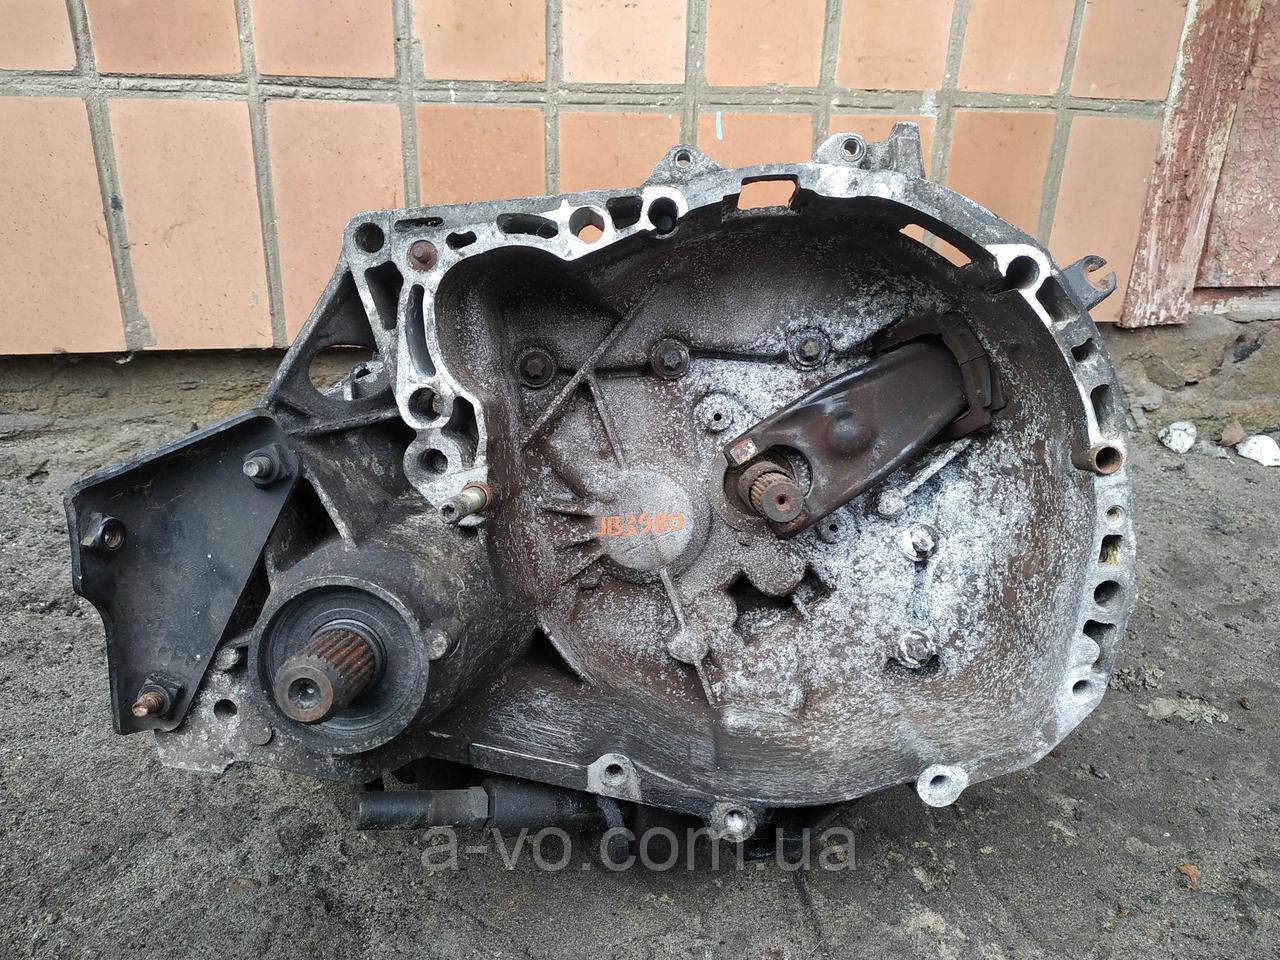 КПП Коробка передач для Renault Clio 2 1.5DCi, JB3980